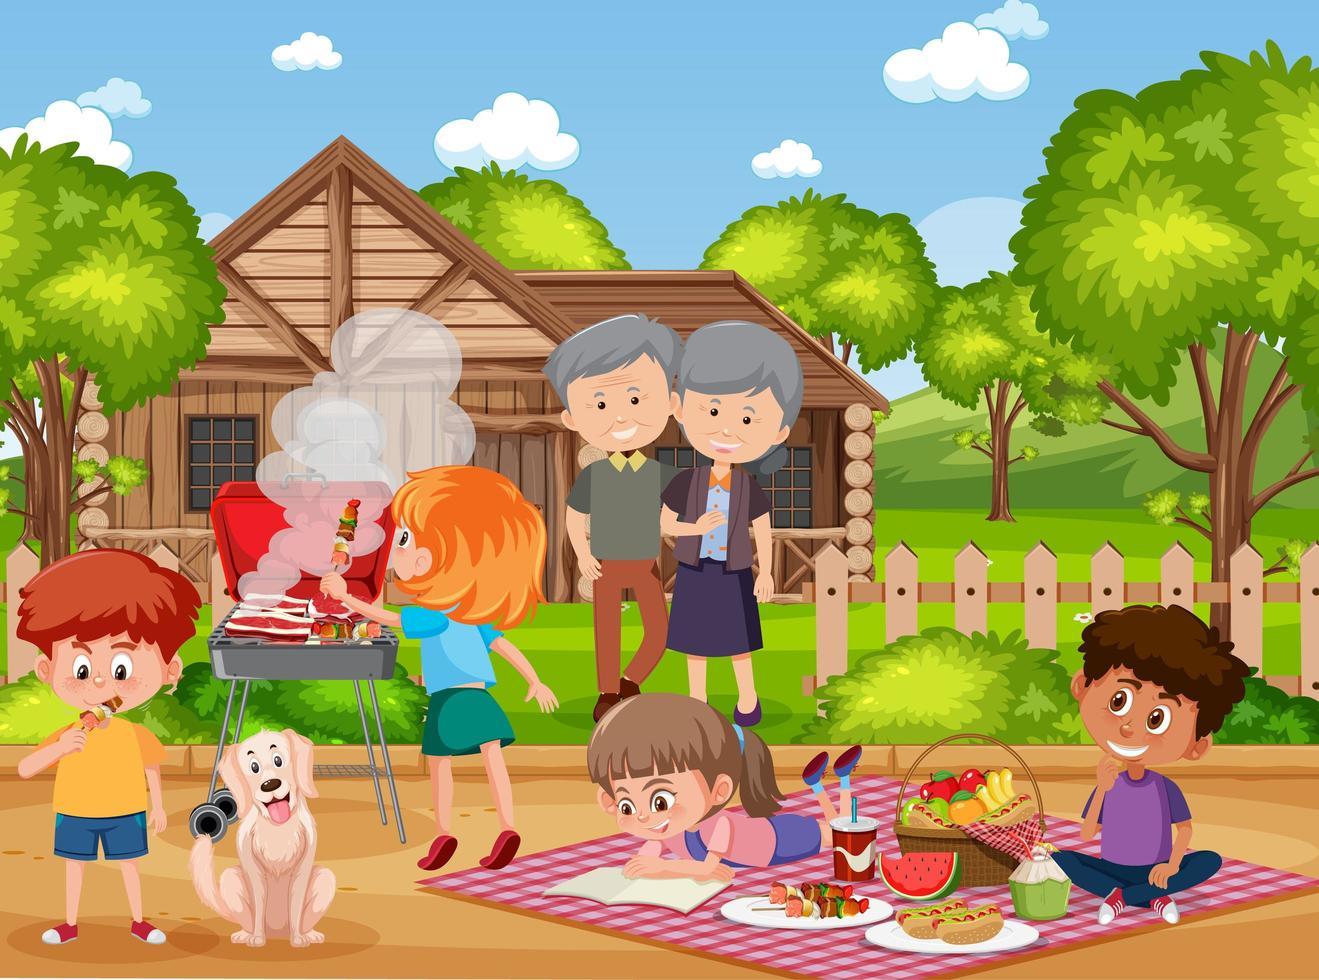 Picnic scene with happy family vector